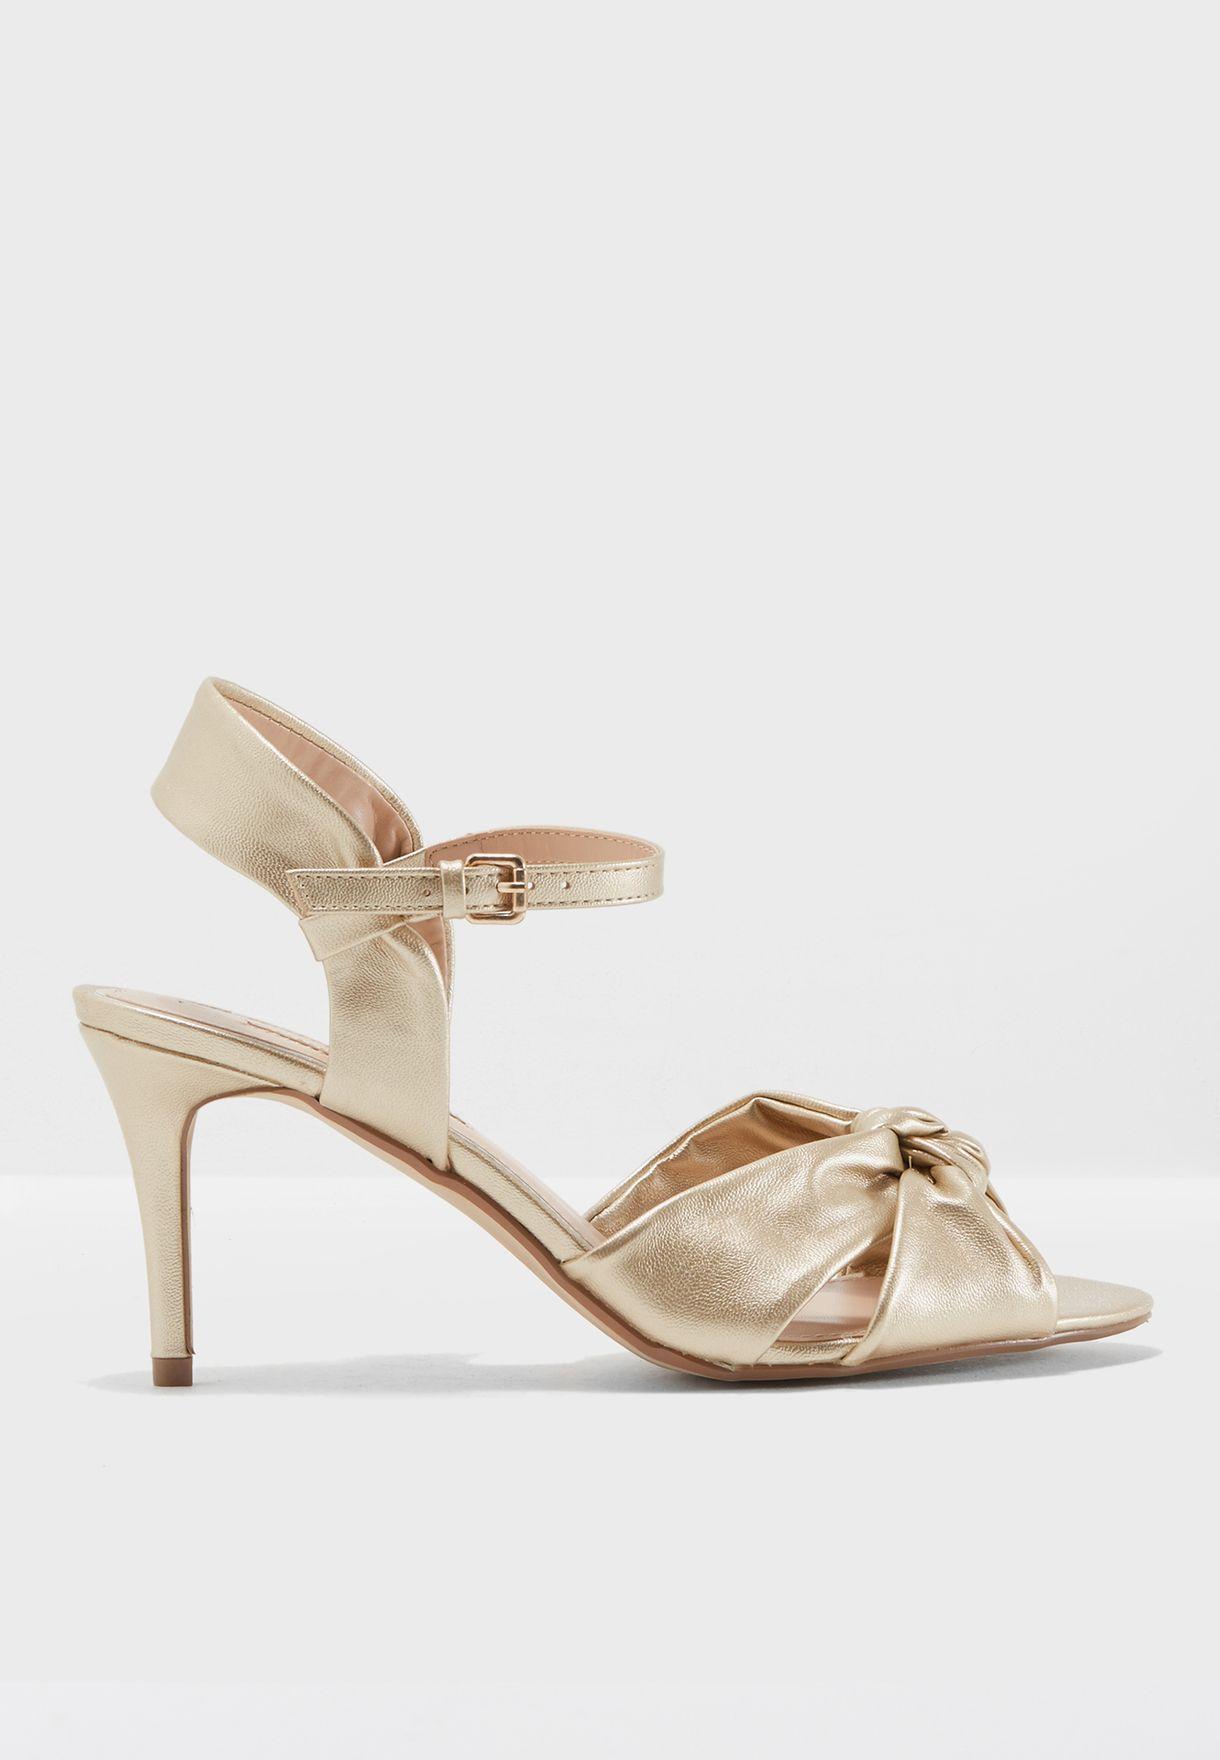 bcf0a7f3705a1 Shop Dorothy Perkins gold Breeze Sandal 19129242 for Women in Qatar ...